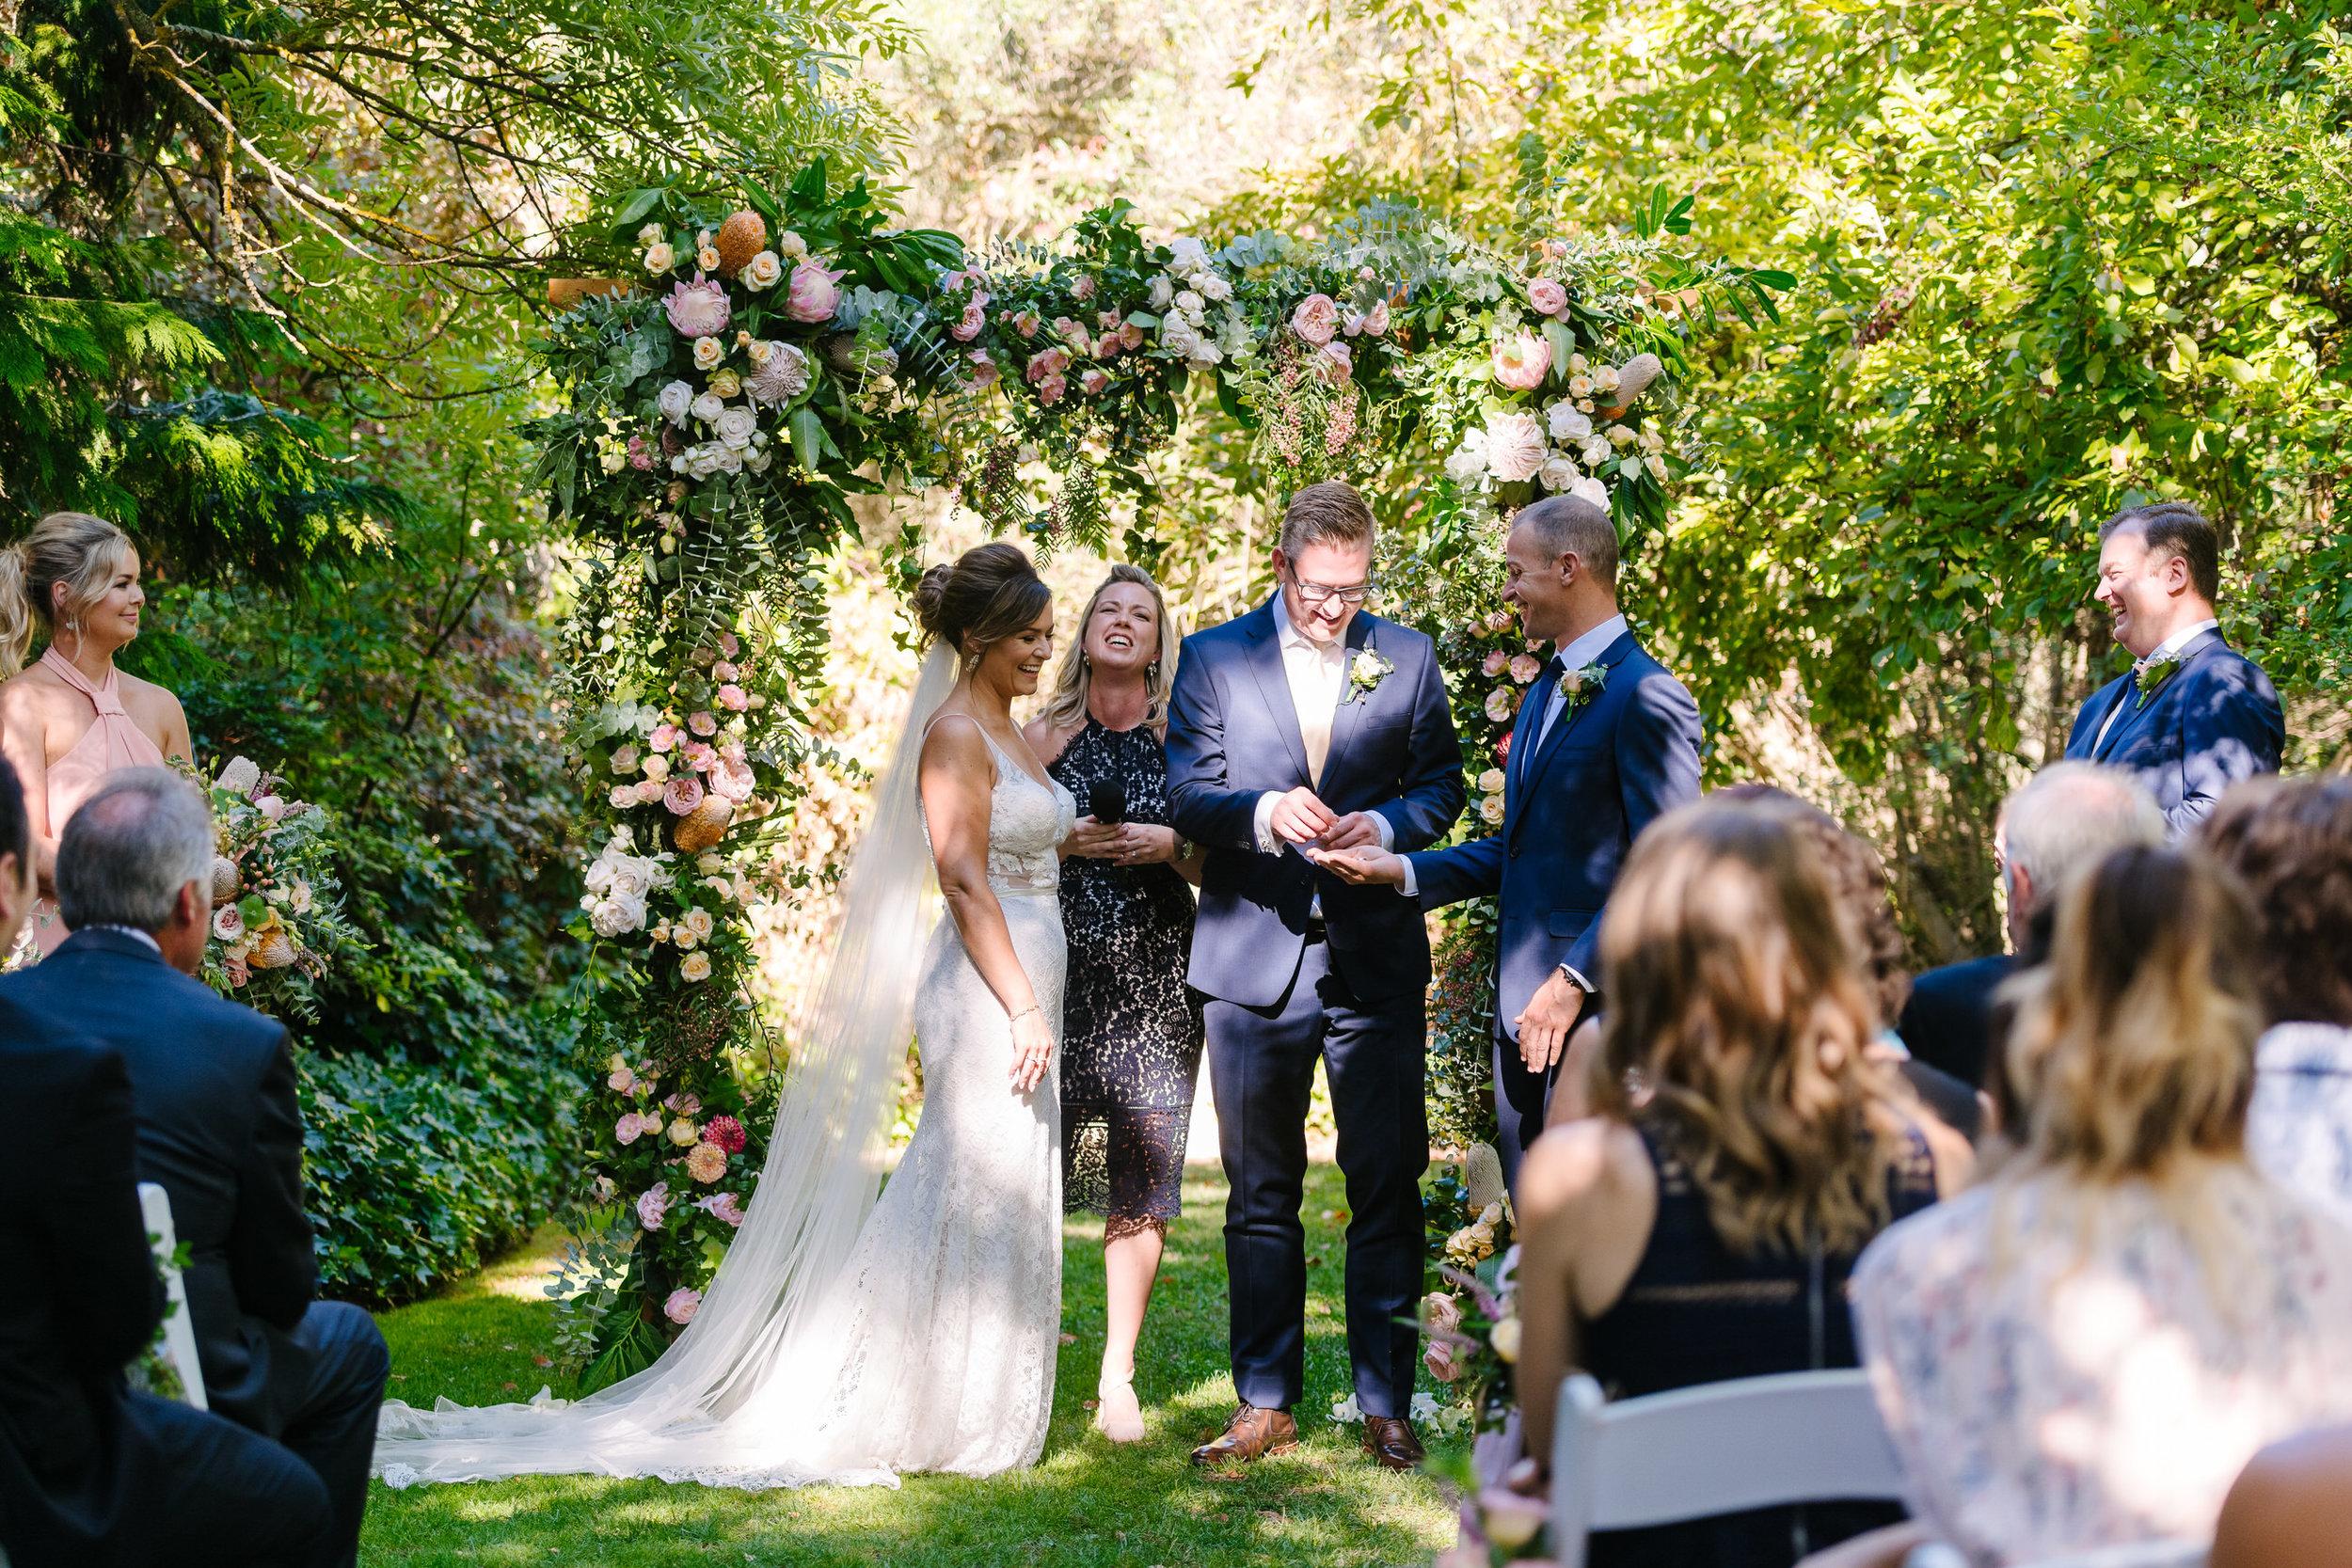 Justin_And_Jim_Photography_Chateau_Dore_Bendigo_Wedding40.JPG